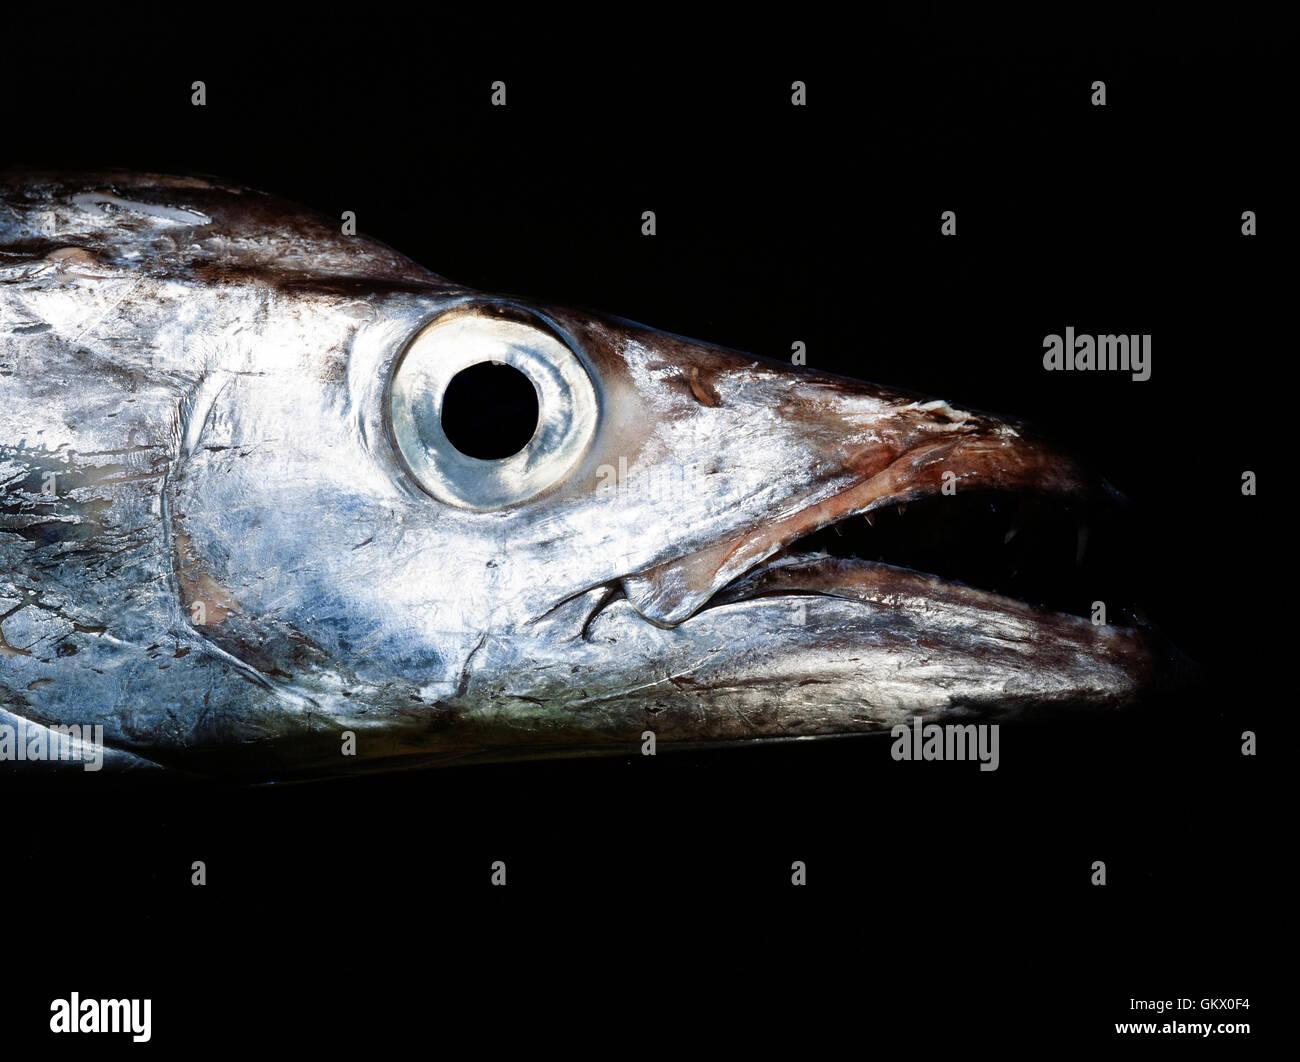 Silver scabbardfish, Lepidopus caudatus. Portugal - Stock Image